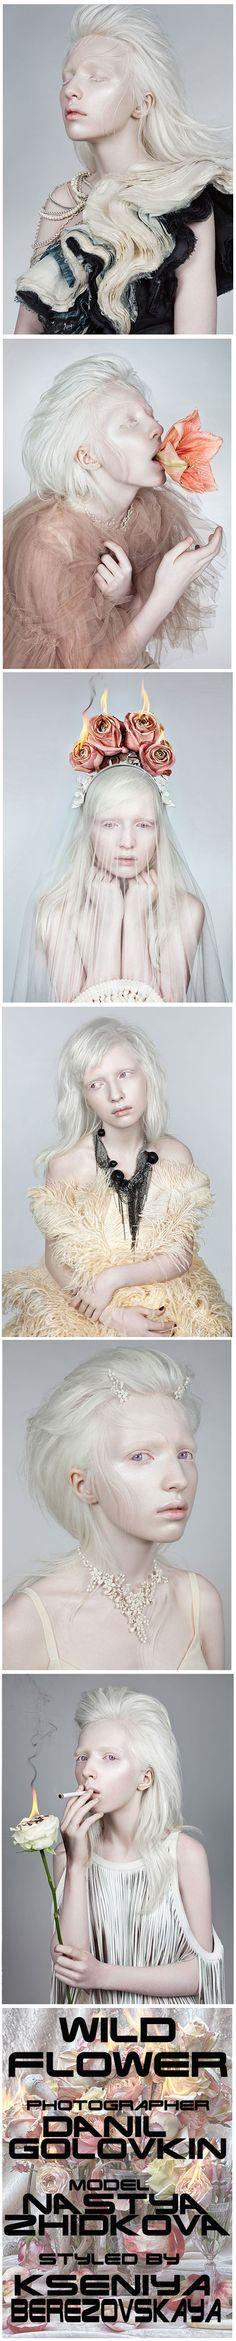 wild flower - model Nastya Zhidkova - photographed by Danil Golovkin for Fashion Gone Rogue